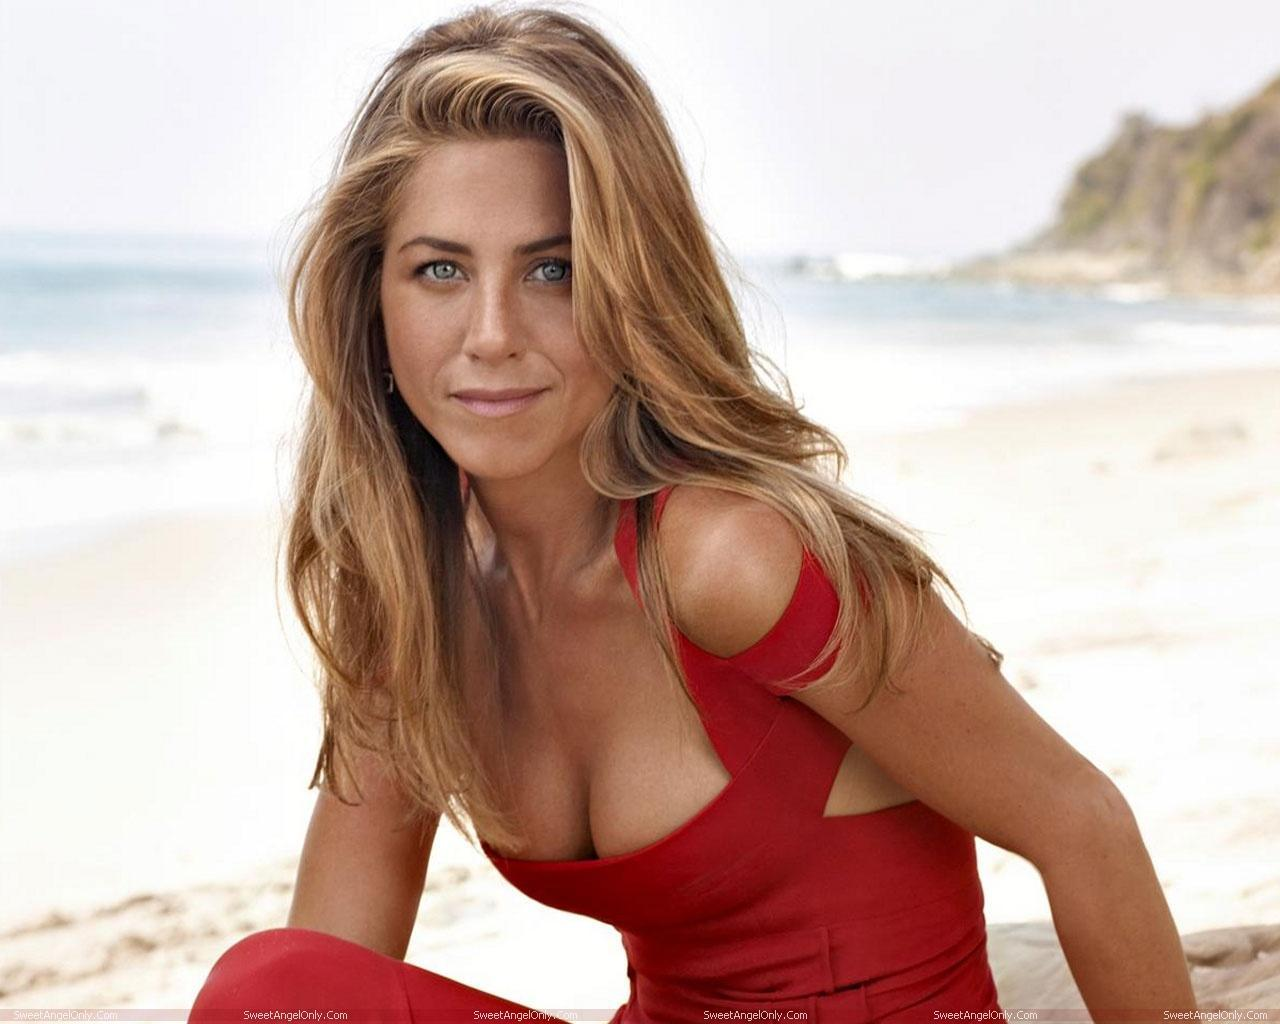 http://1.bp.blogspot.com/-GhKtRy6oB1A/TWVr0lAL_bI/AAAAAAAAEkA/ZD3UCu-kc0M/s1600/actress_jennifer_aniston_hot_wallpapers_in_bikini_sweetangelonly_09.jpg